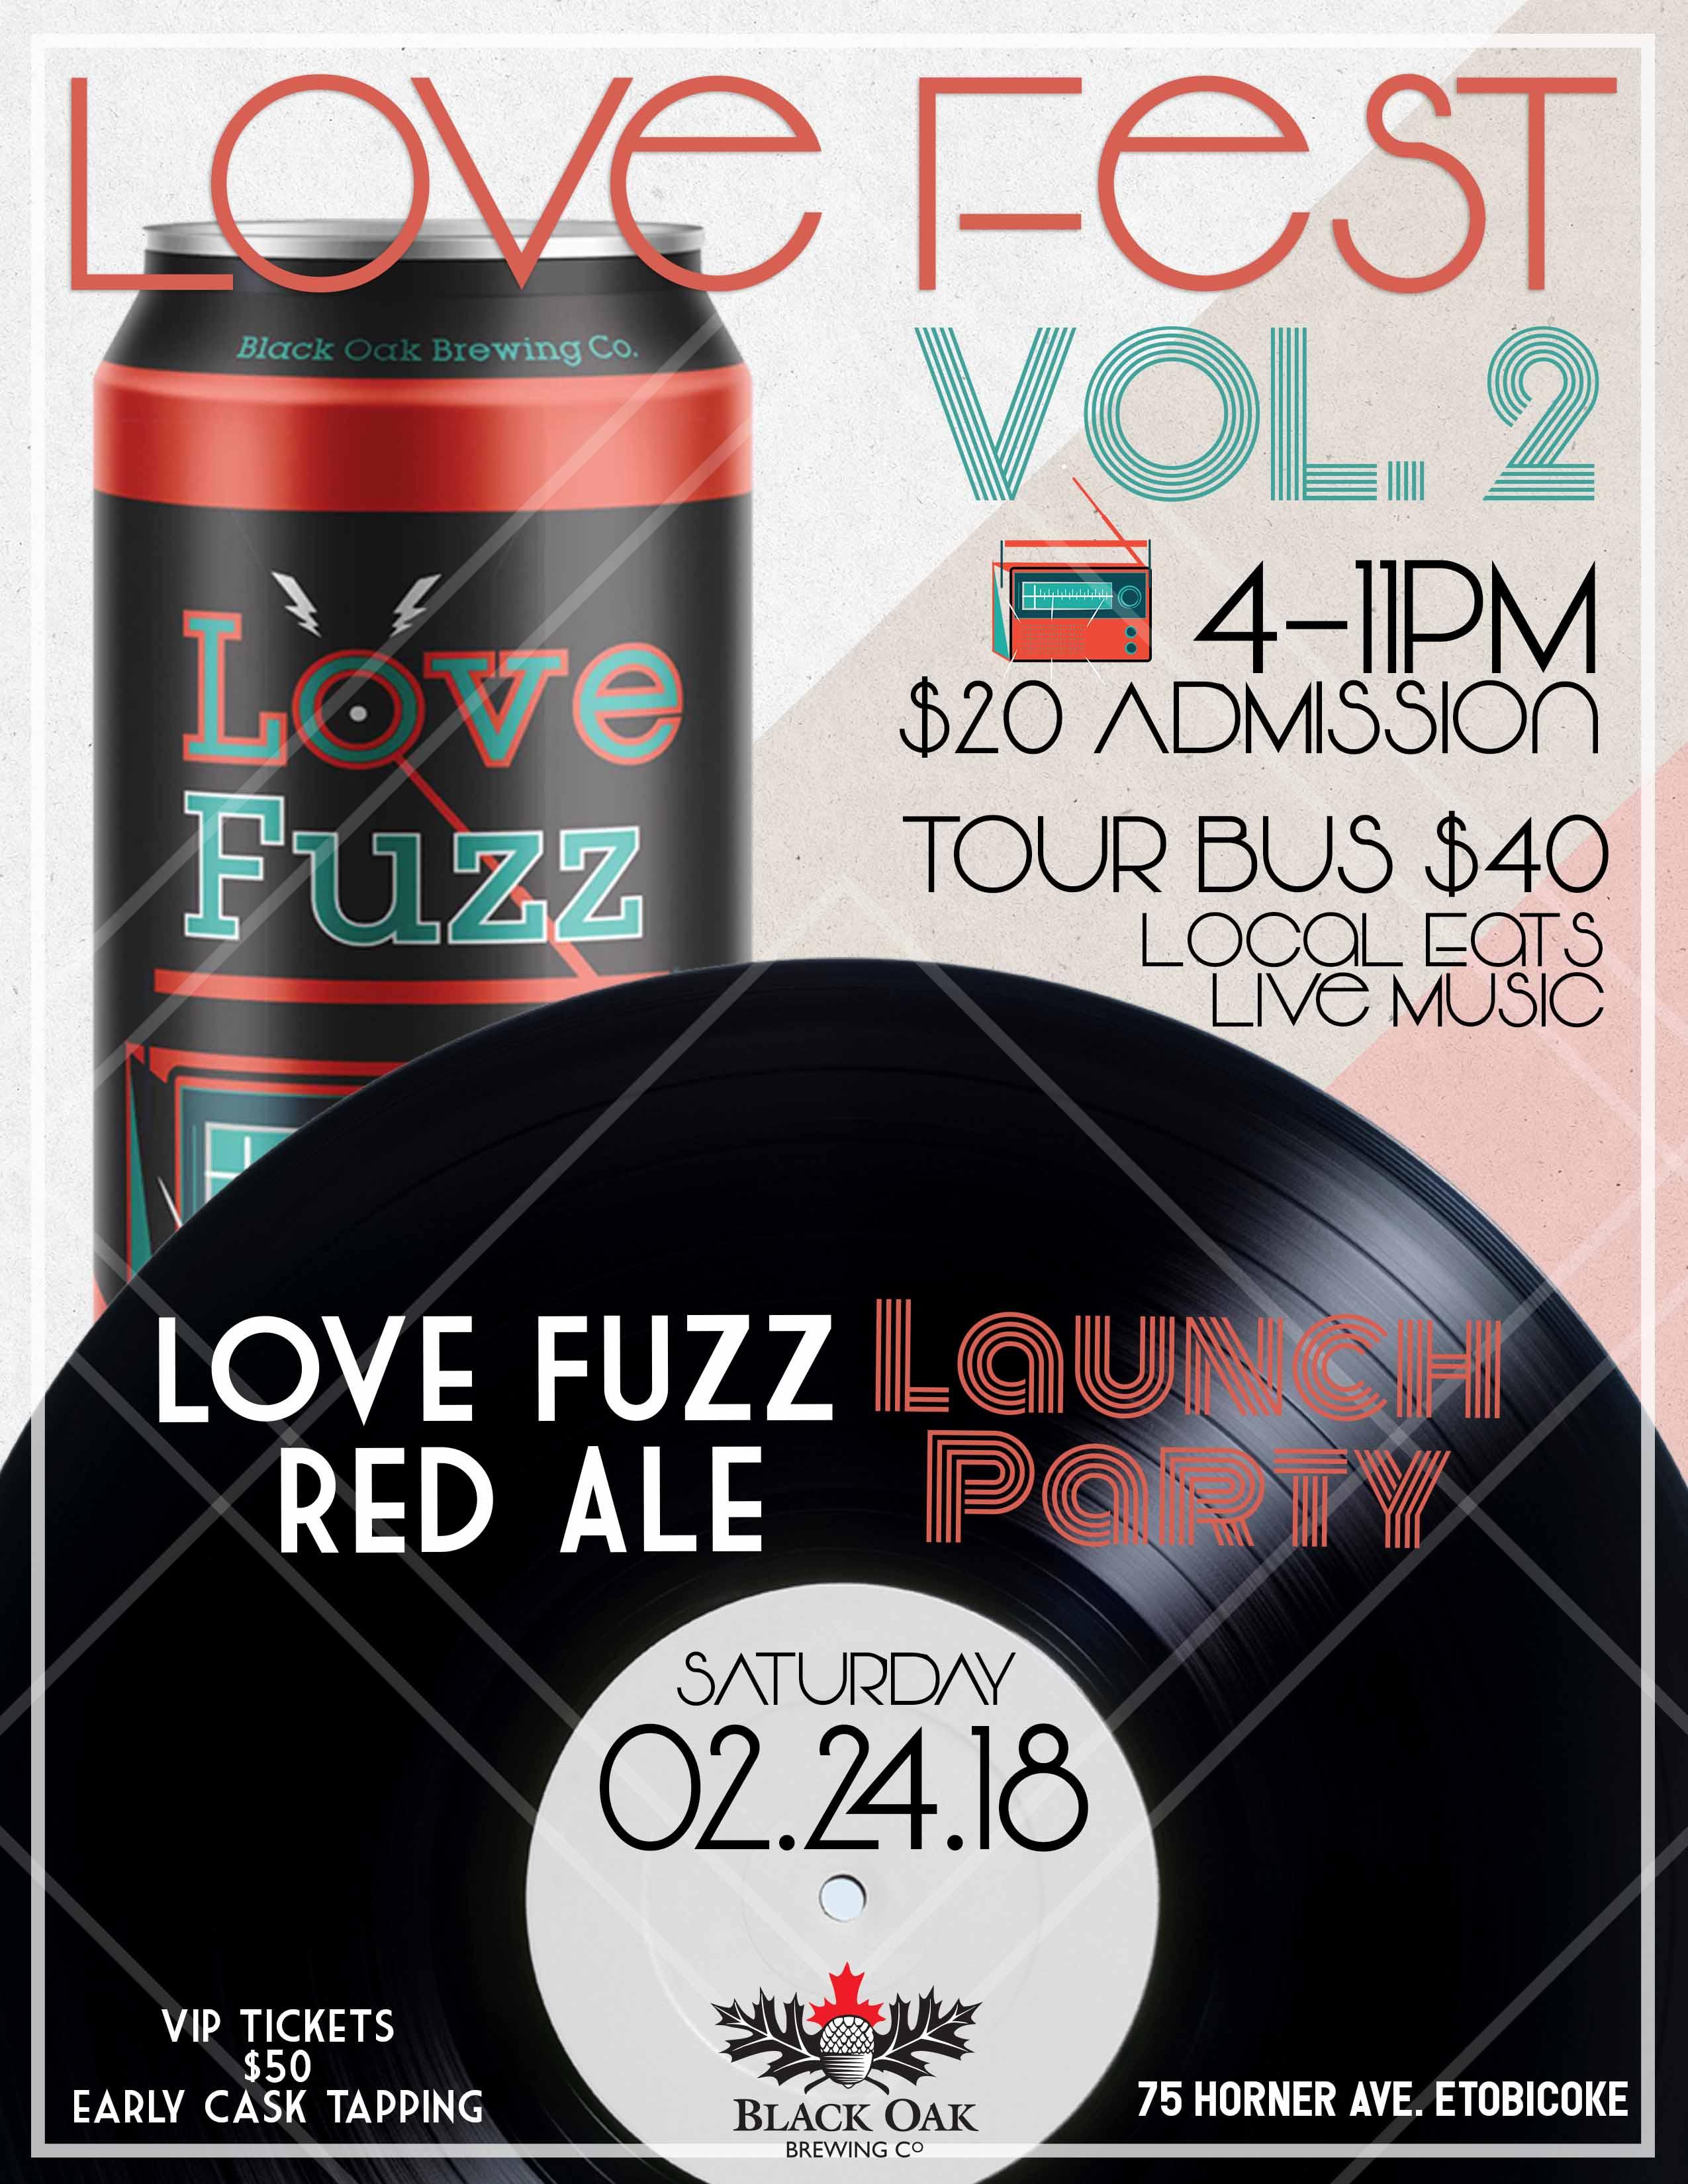 Love Fest Vol.2